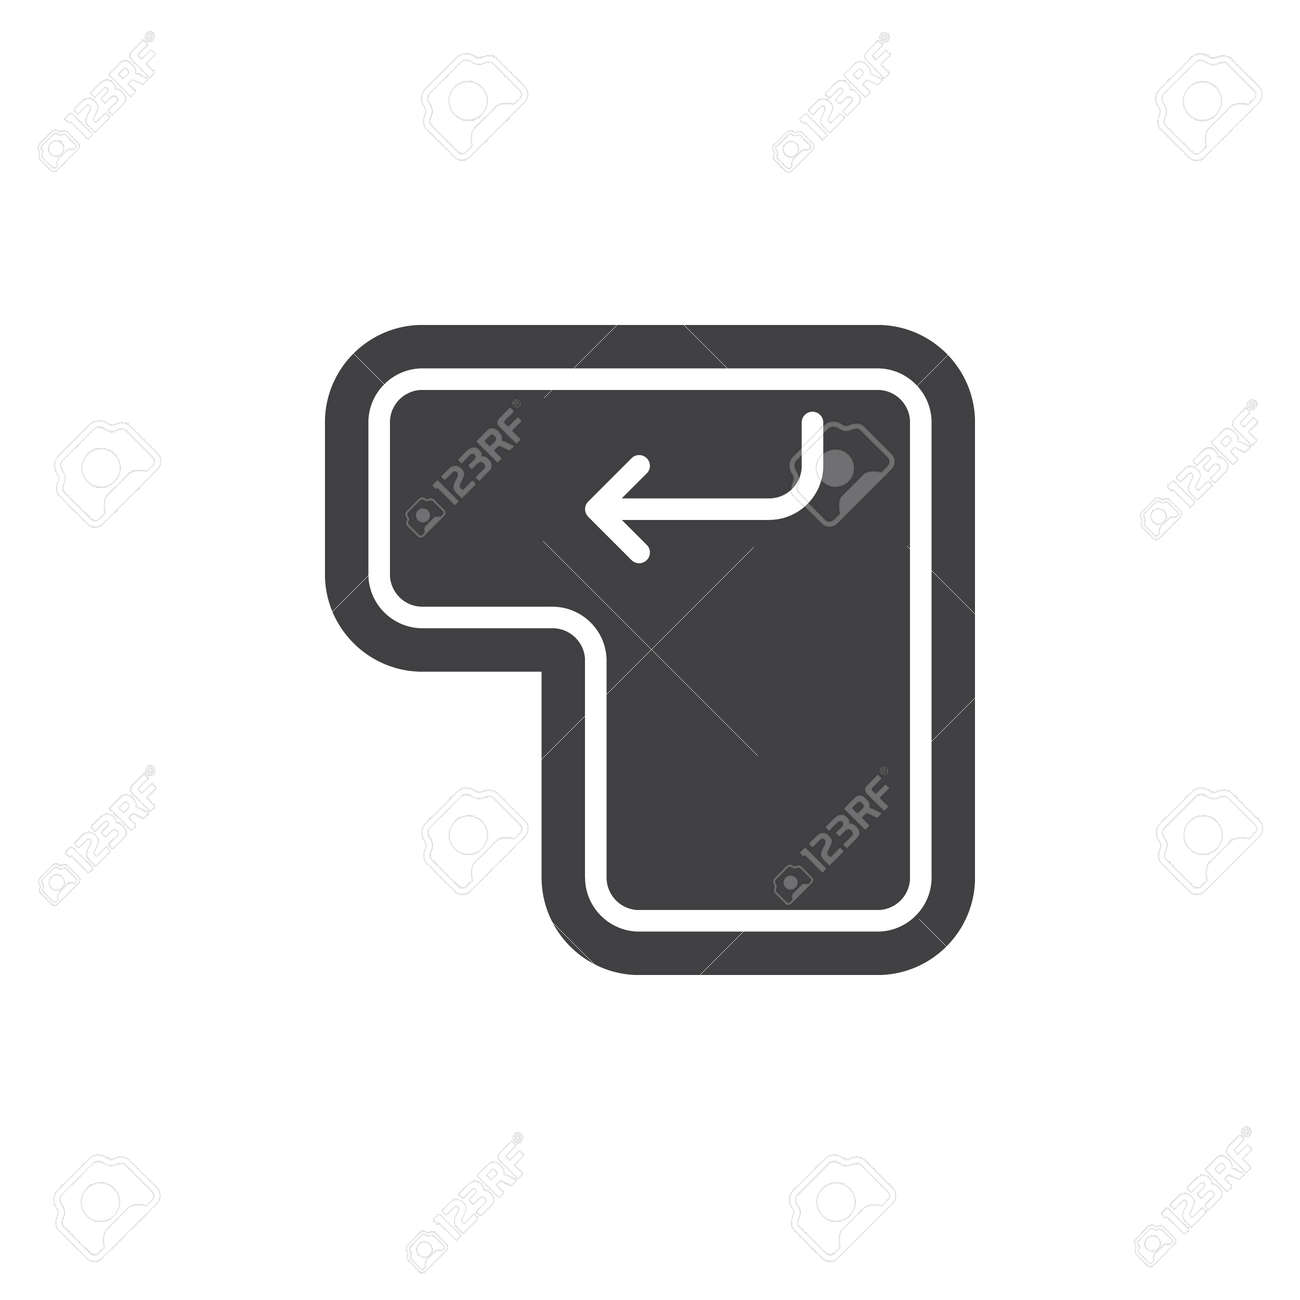 Enter keyboard key icon vector, filled flat sign, solid pictogram